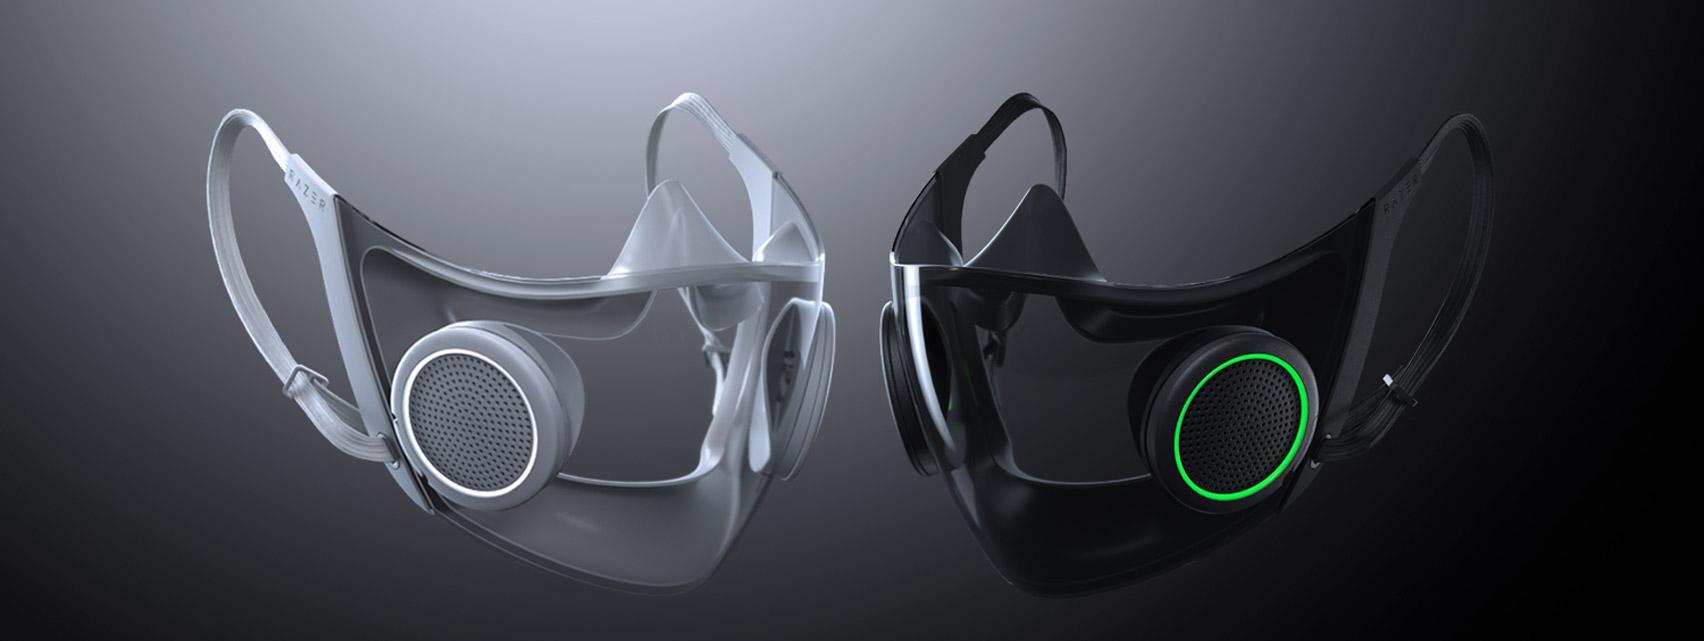 Razer's concept mask in black and white